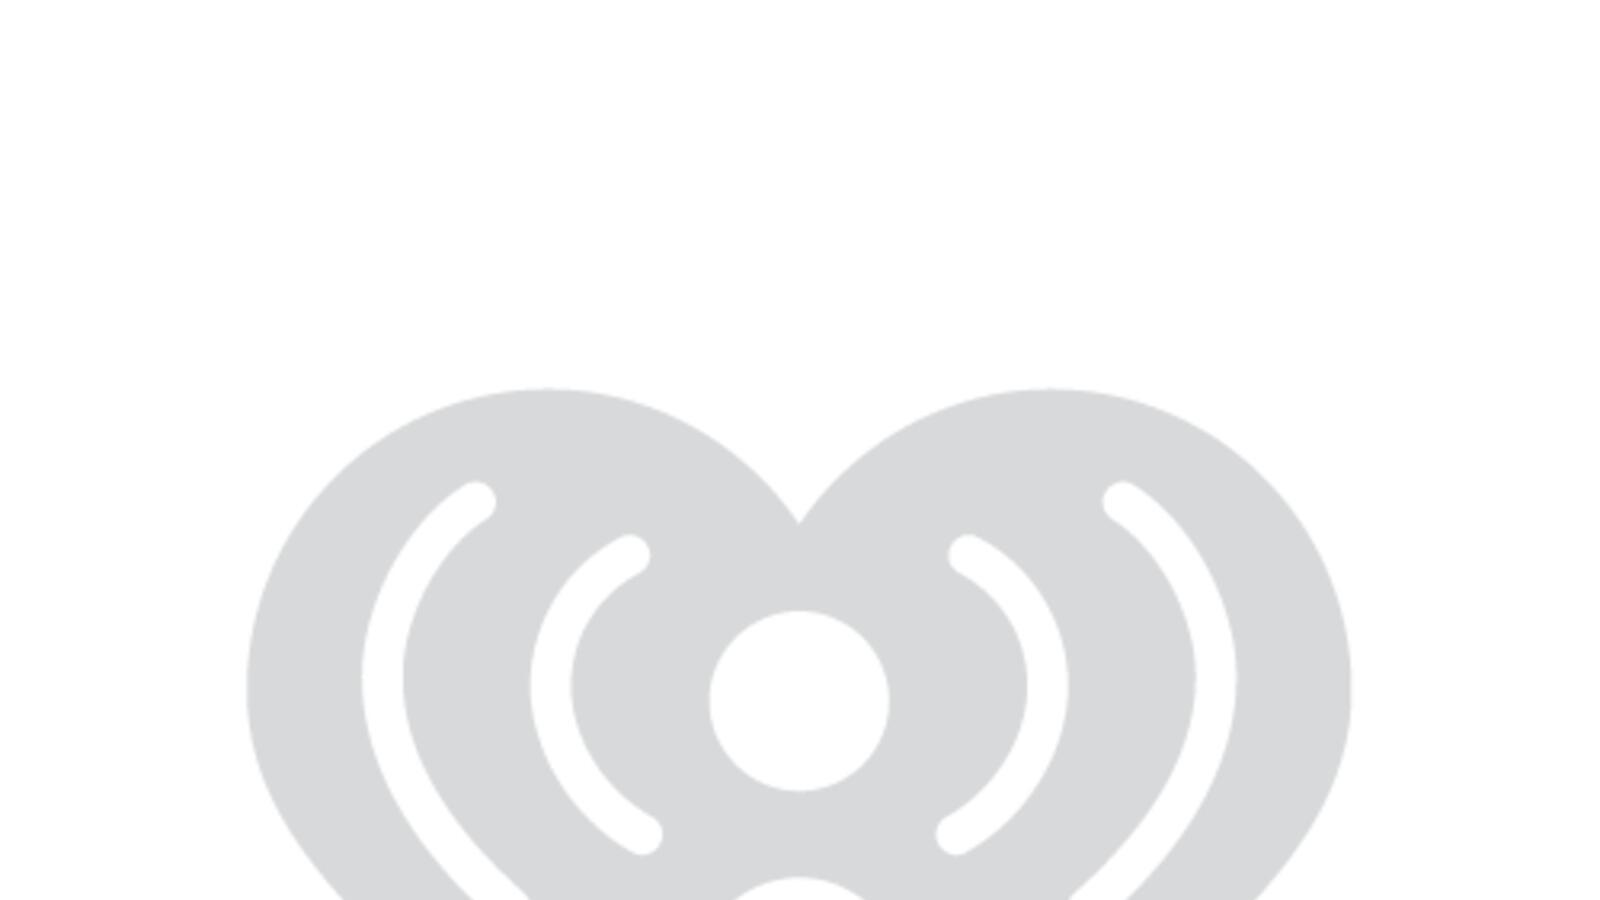 Some Florida Teachers' $1000 Bonus Checks Bounce